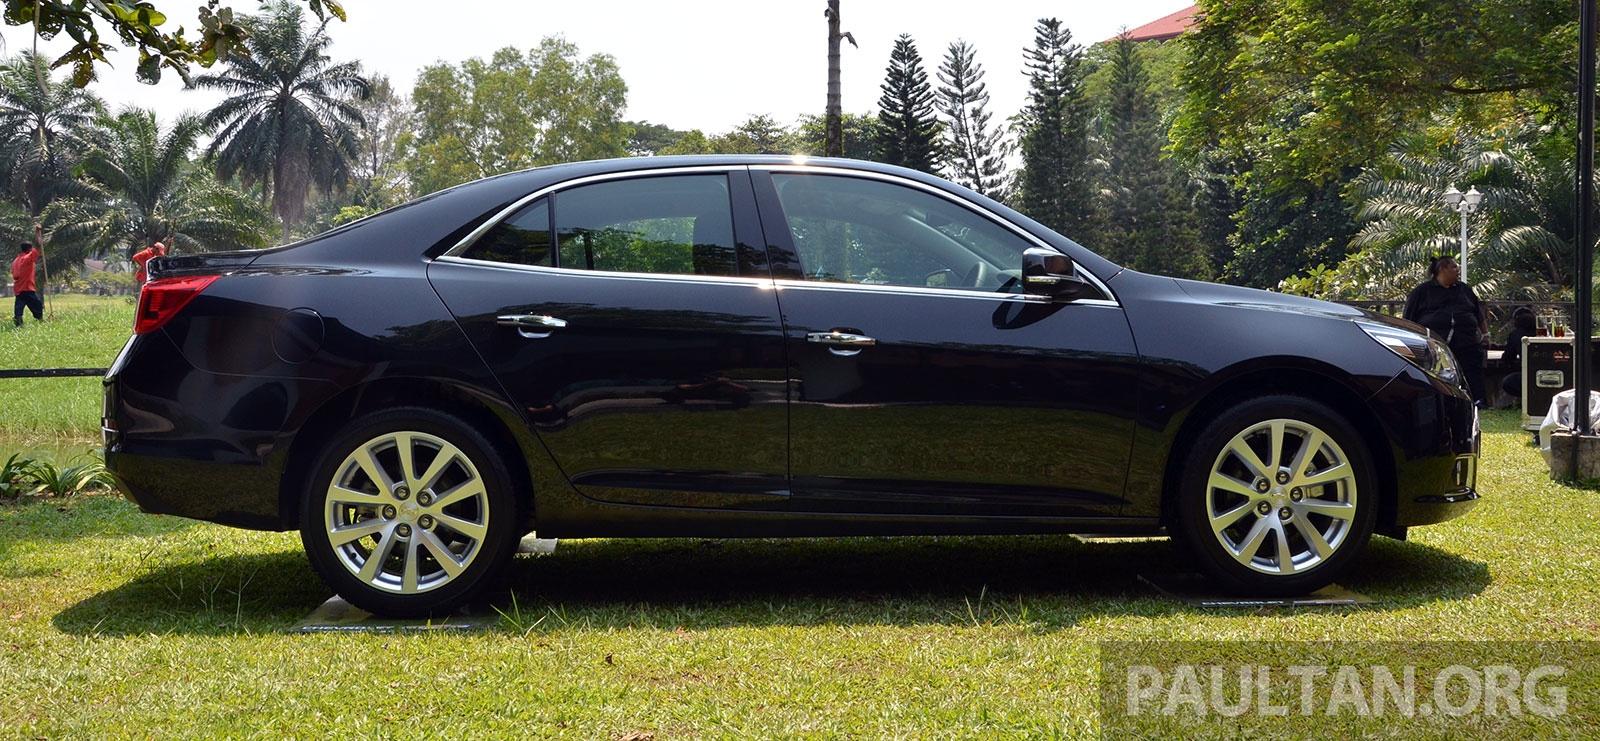 Malibu 2018 >> Chevrolet Malibu launched in Malaysia – 2.4L, RM155k Paul Tan - Image 267924